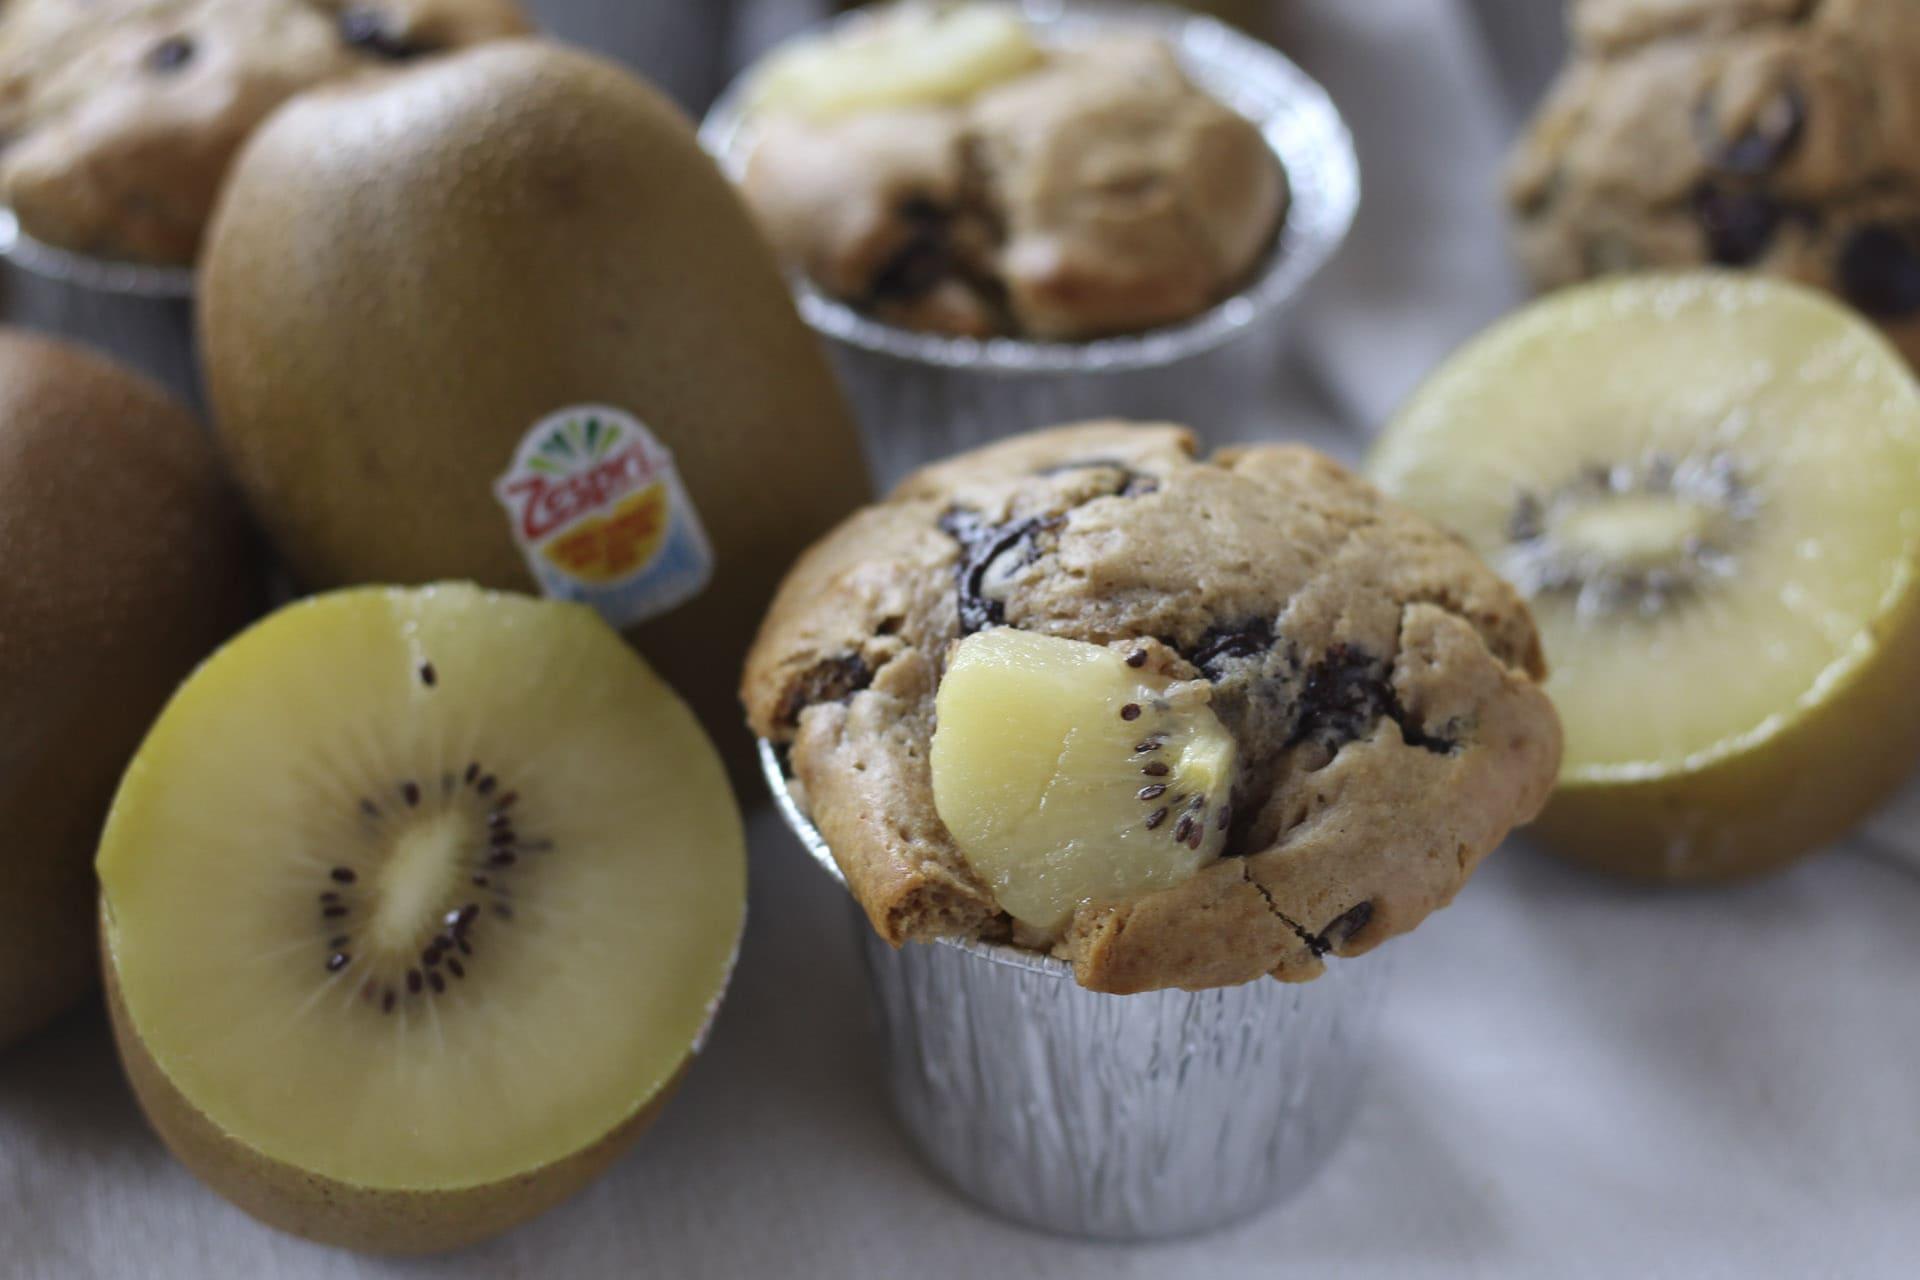 Muffins de kiwi Zespri Sungold y chocolate